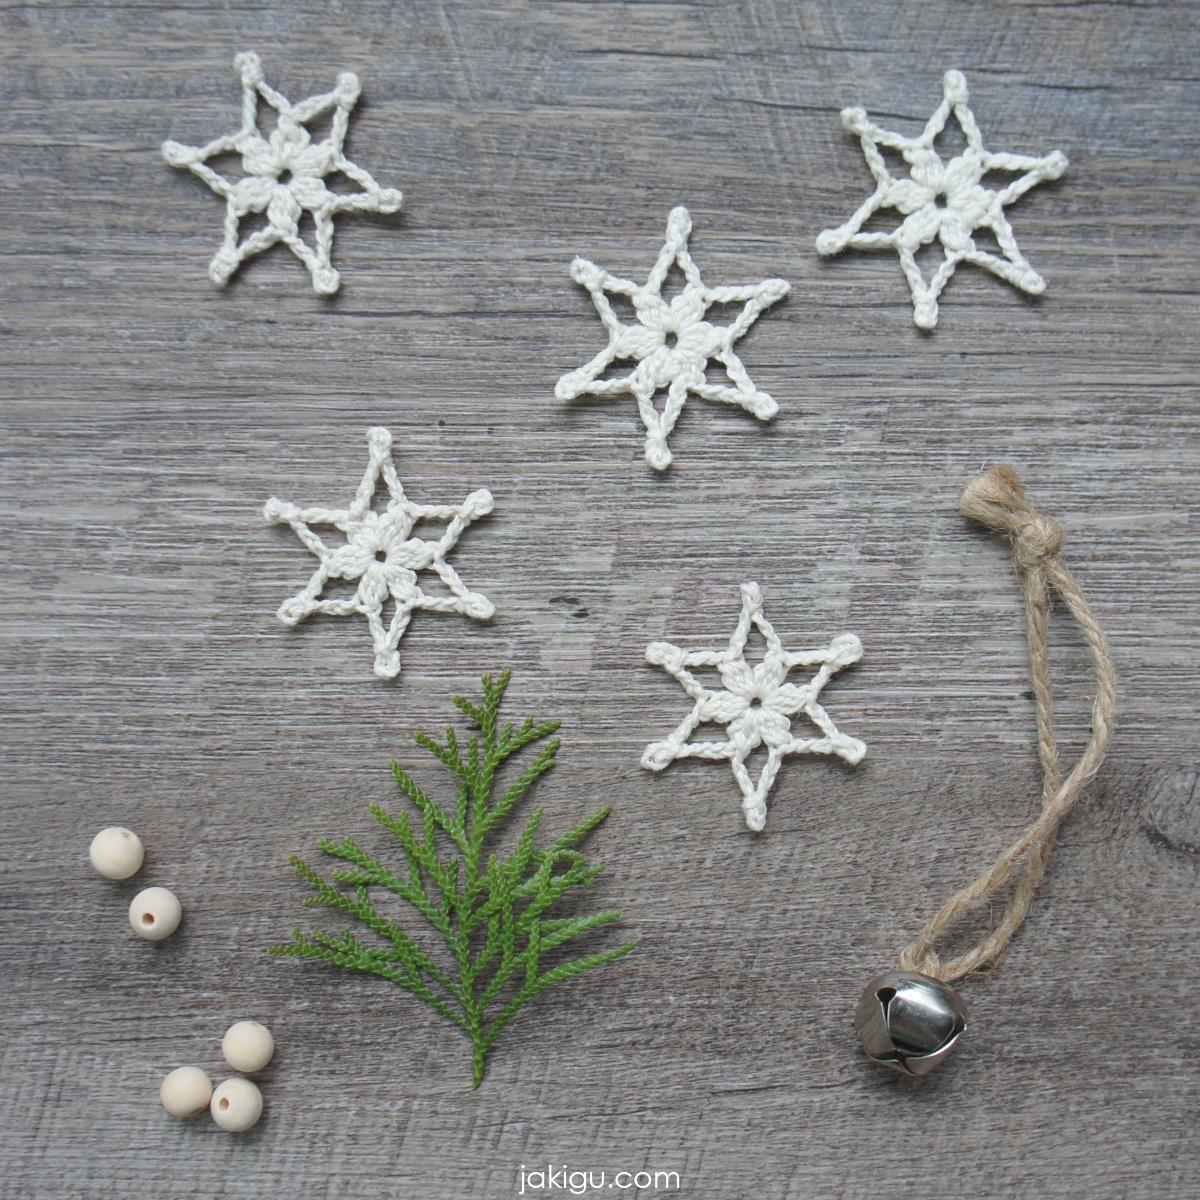 jakigu.com | snowflake 2019 | free crochet pattern